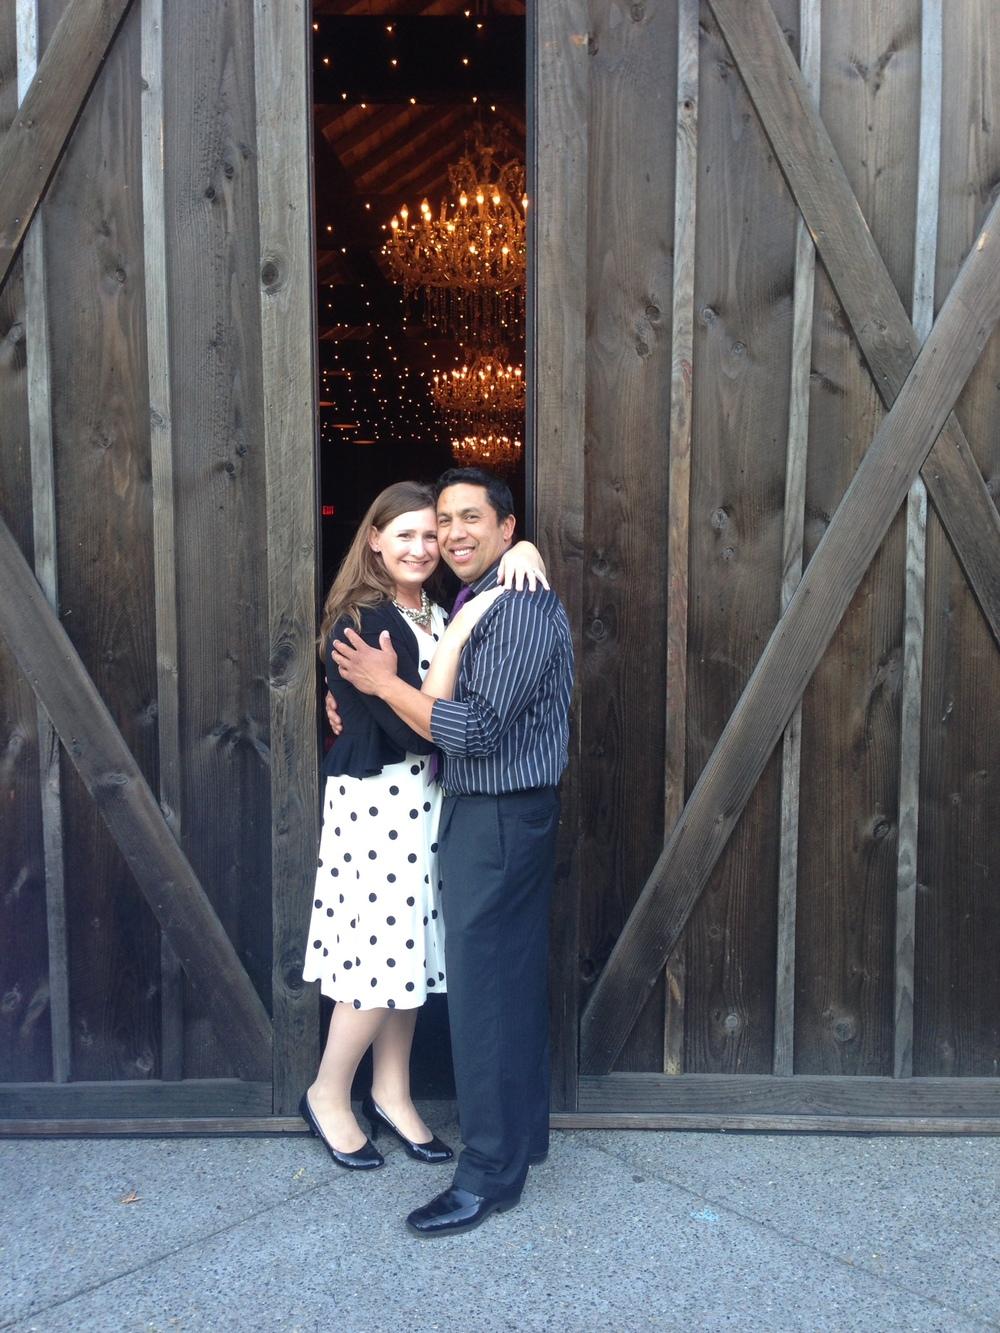 Mark & Cynthia Harp